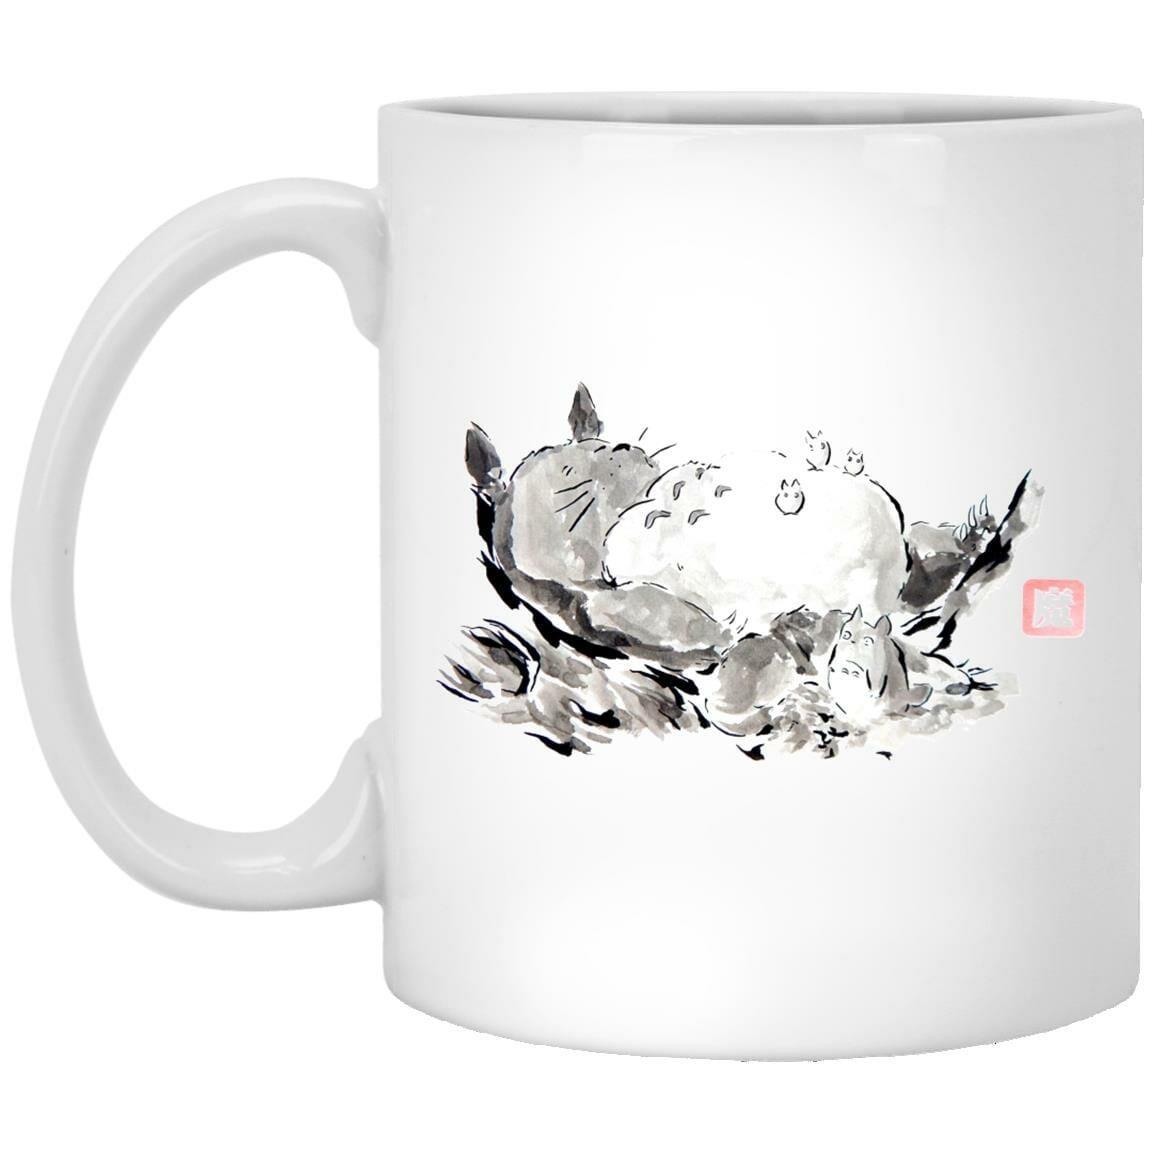 Sleeping Totoro ink Painting Mug